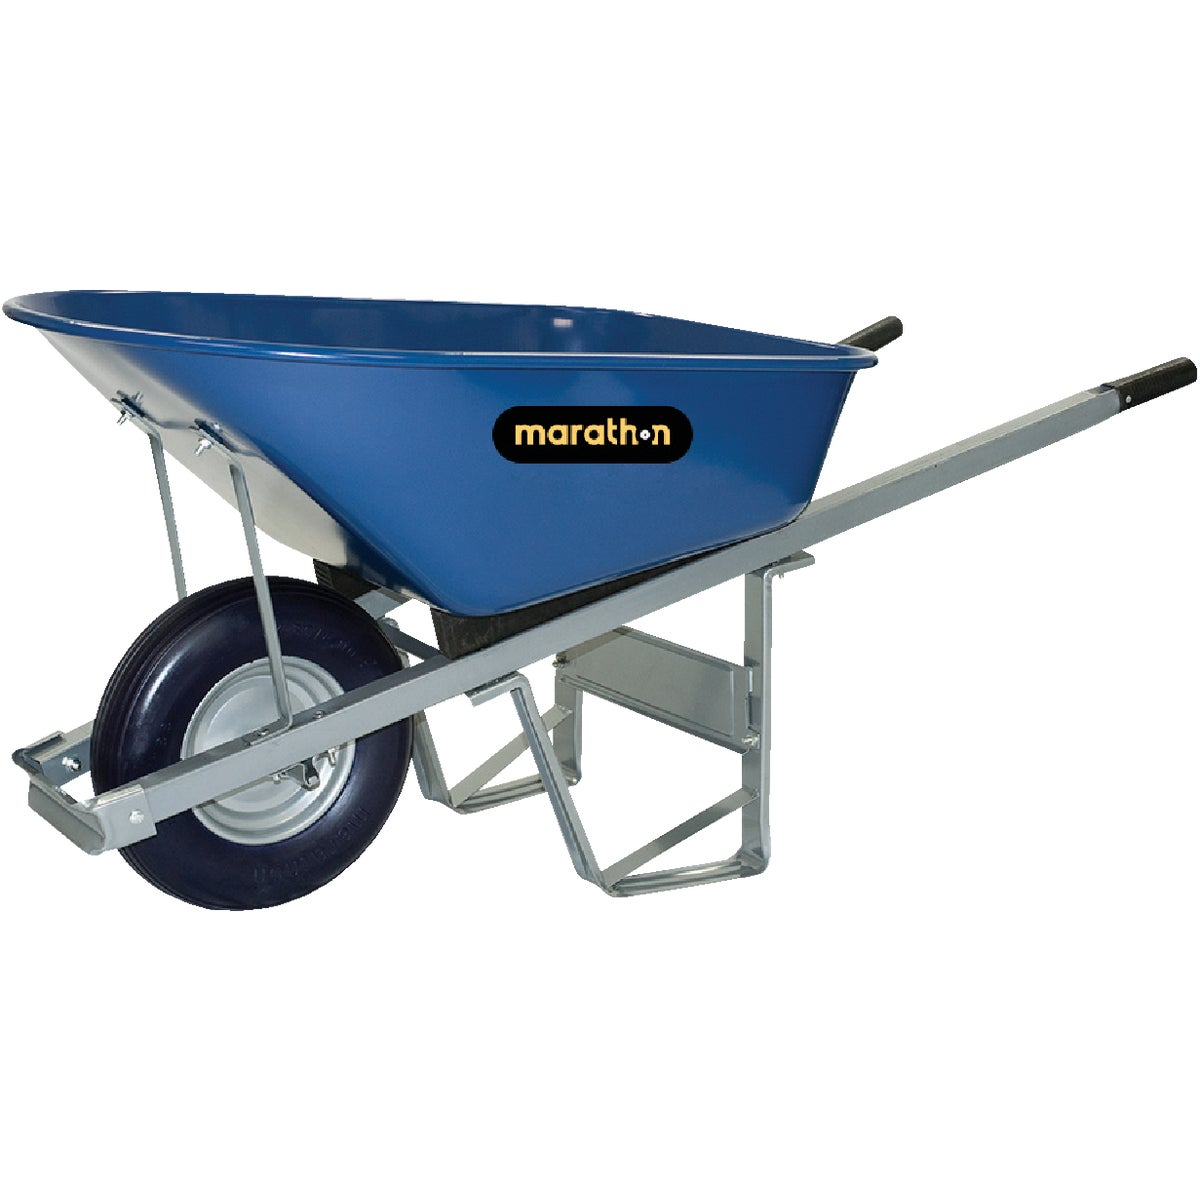 Marathon Contractor Steel Wheelbarrow, 70002